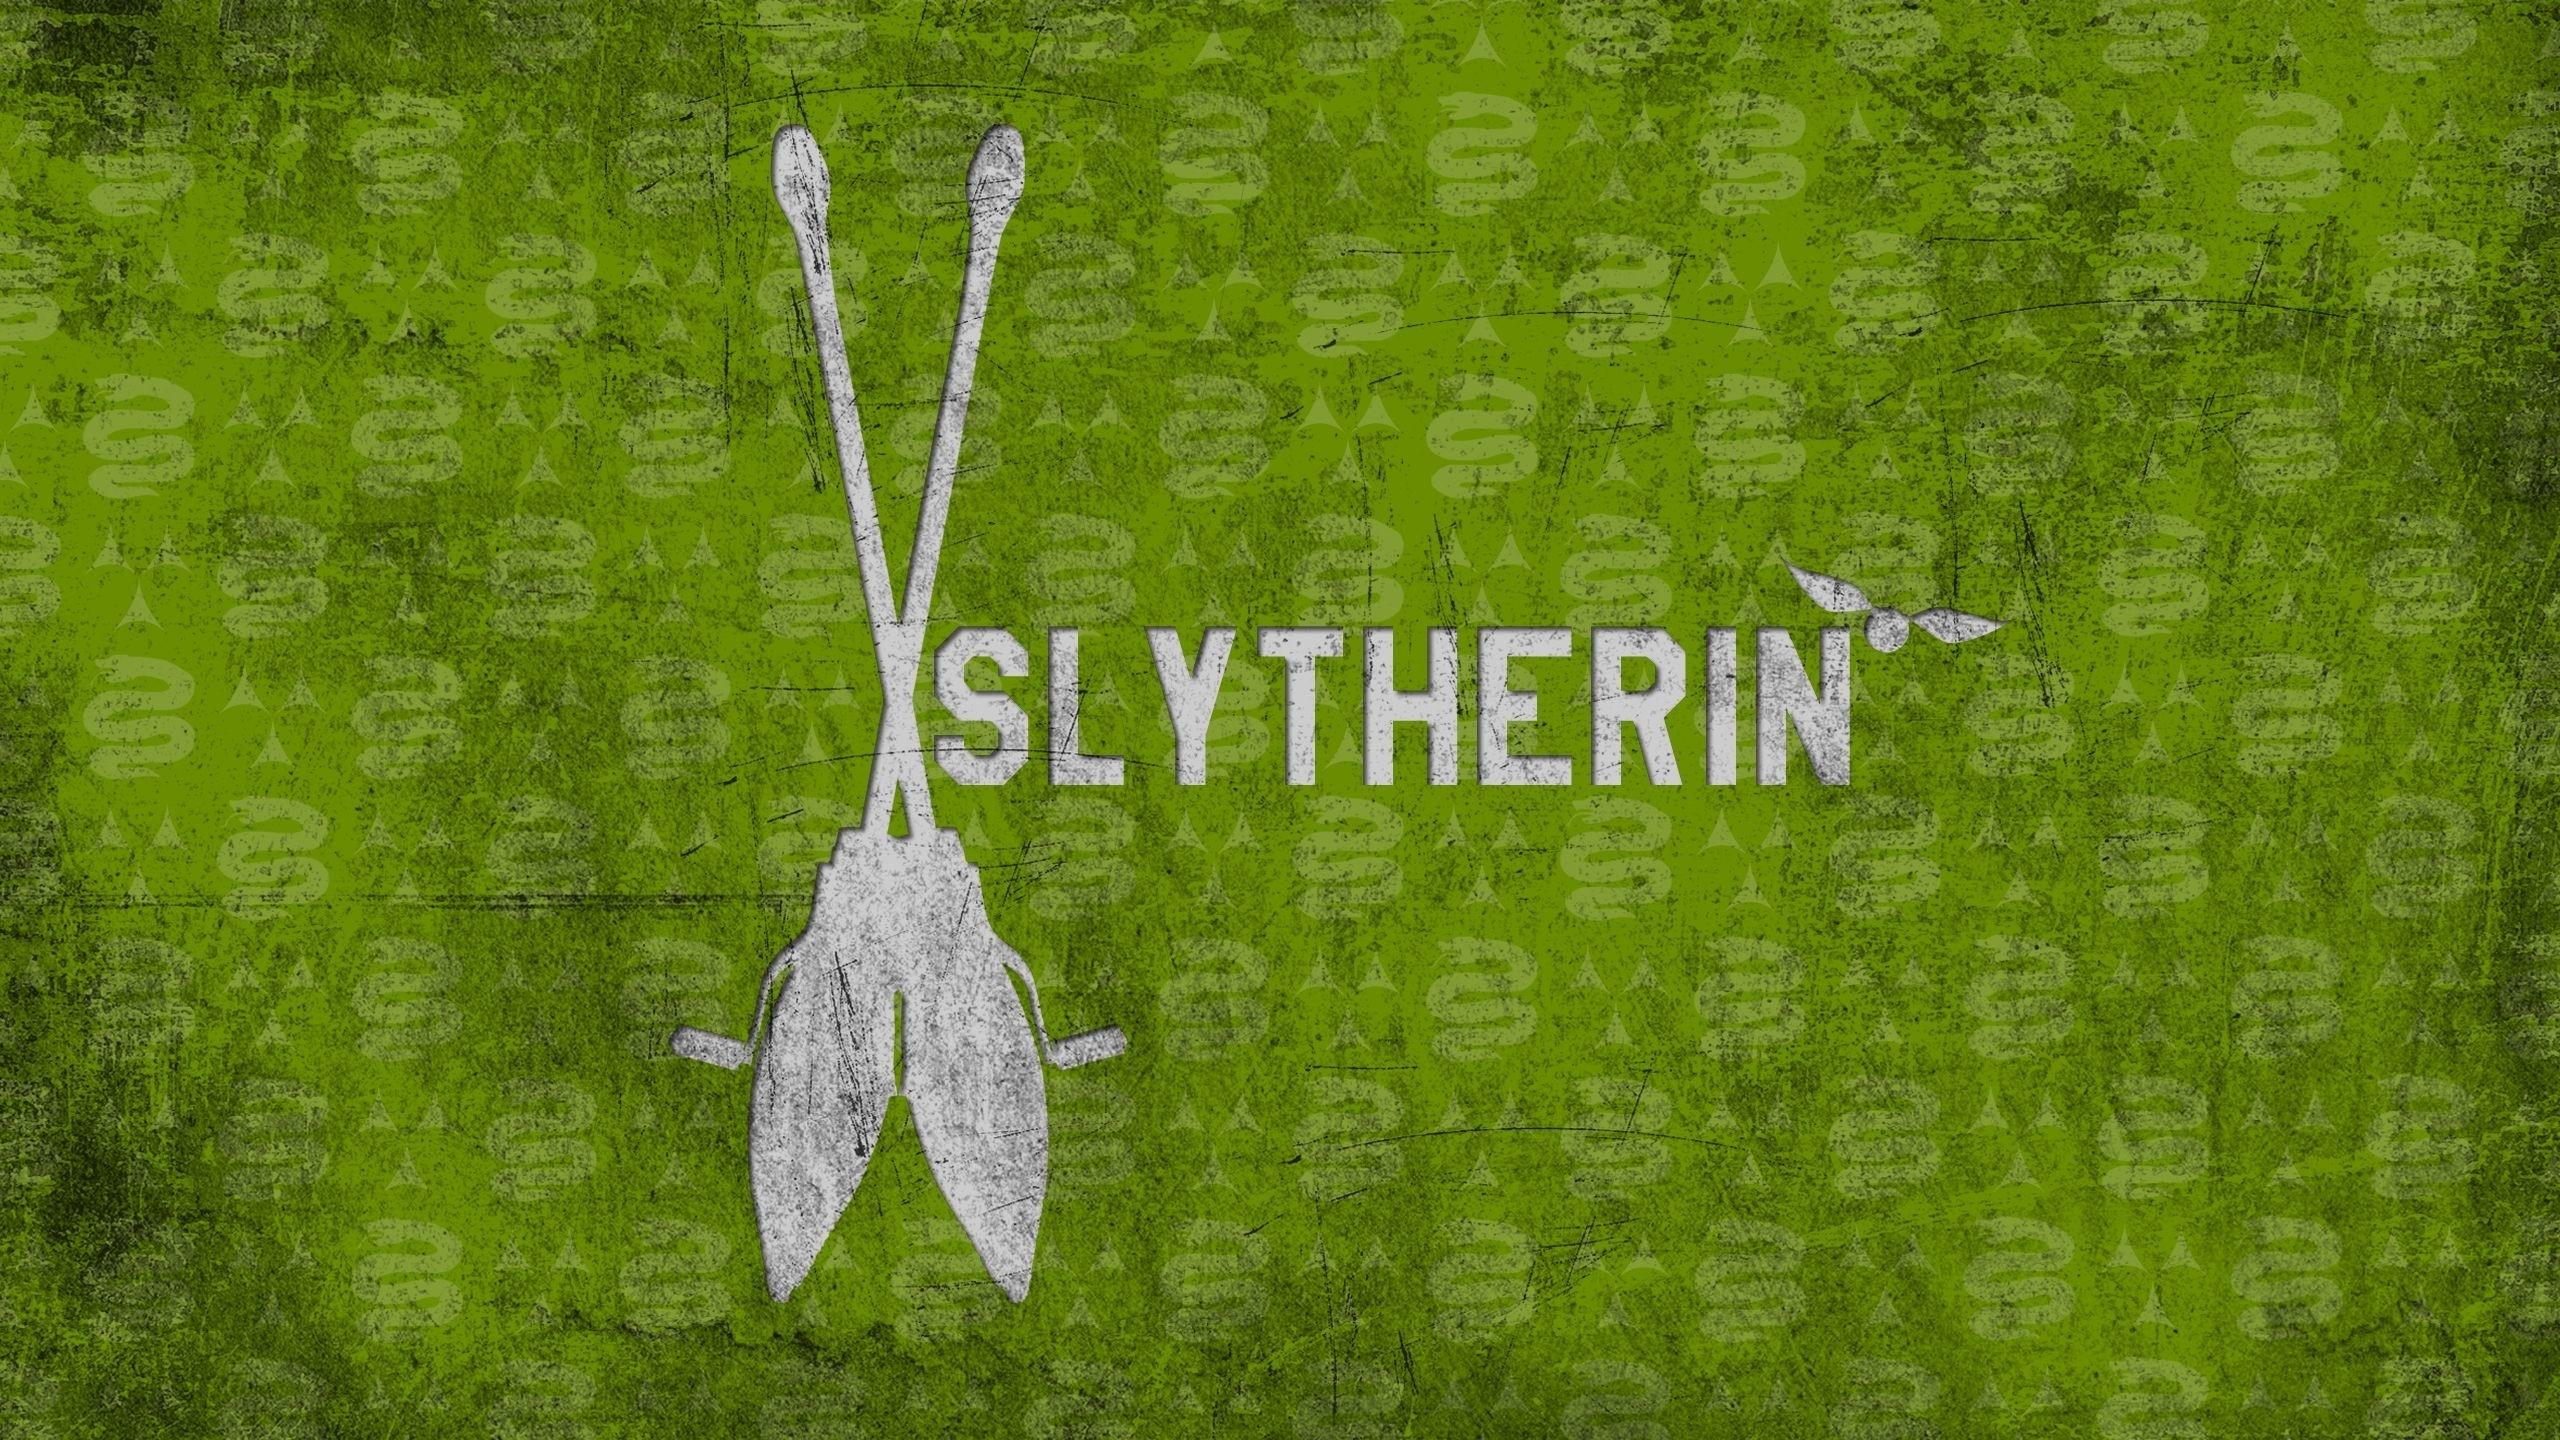 harry potter slytherin wallpaper (62+ images)